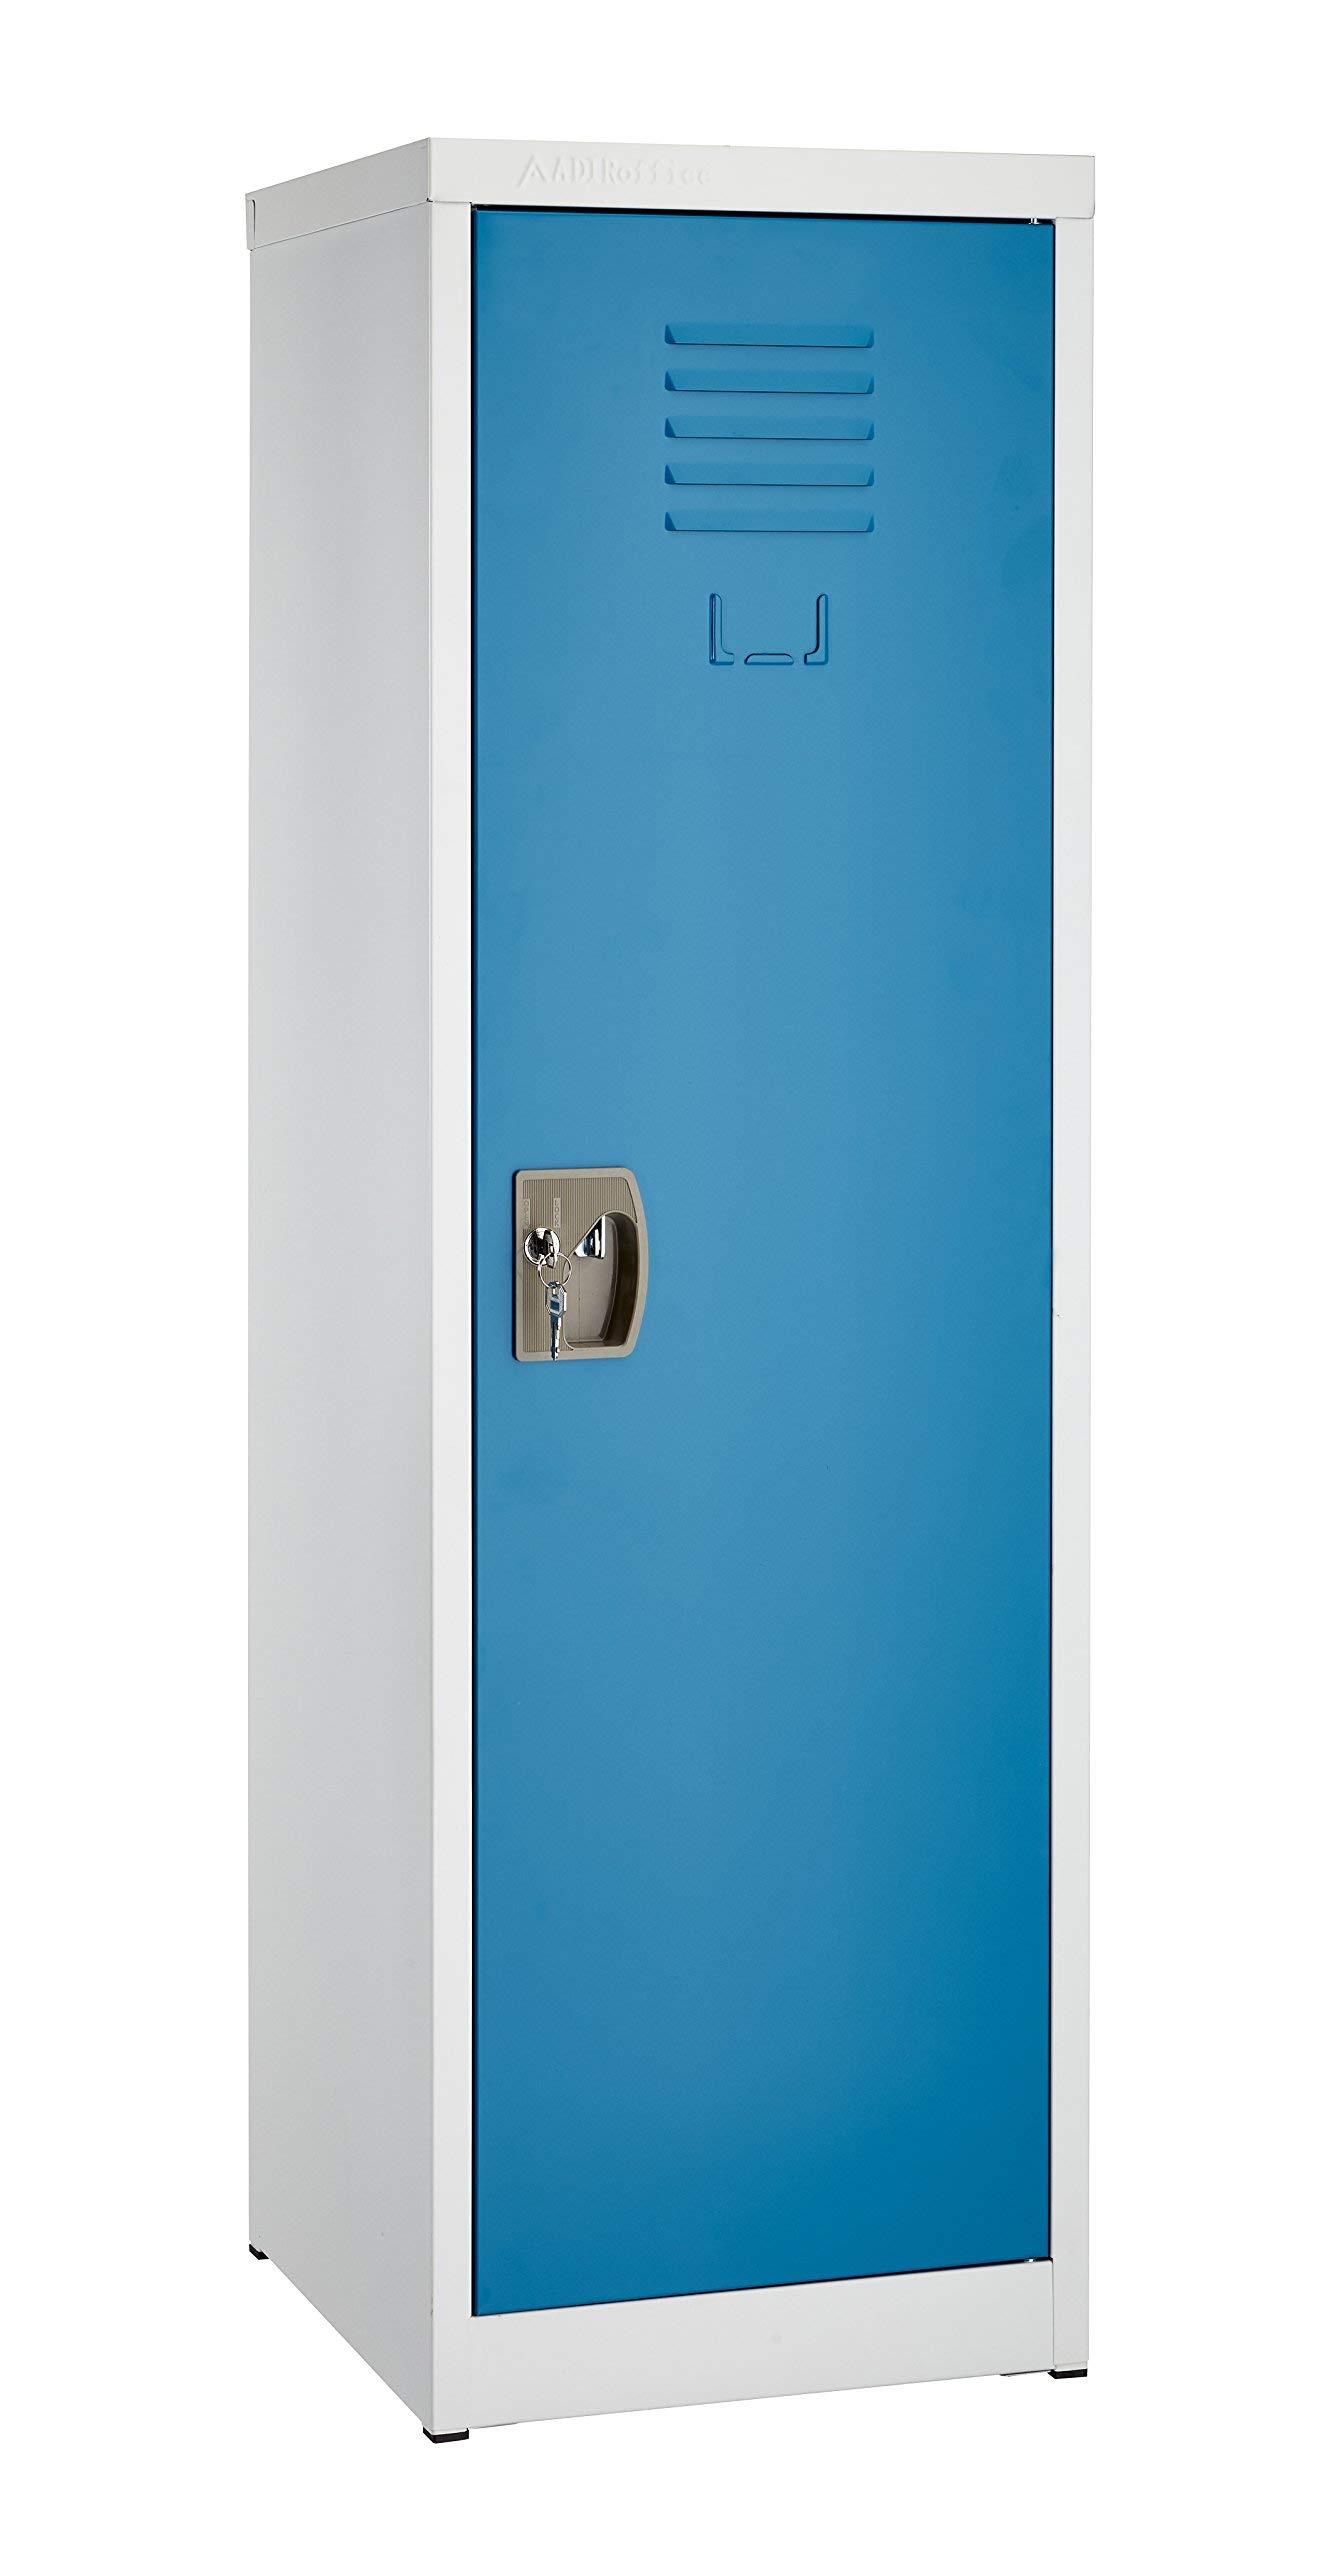 AdirOffice Kids Steel Metal Storage Locker - for Home & School - with Key & Hanging Rods (48 Inch, Blue) by AdirOffice